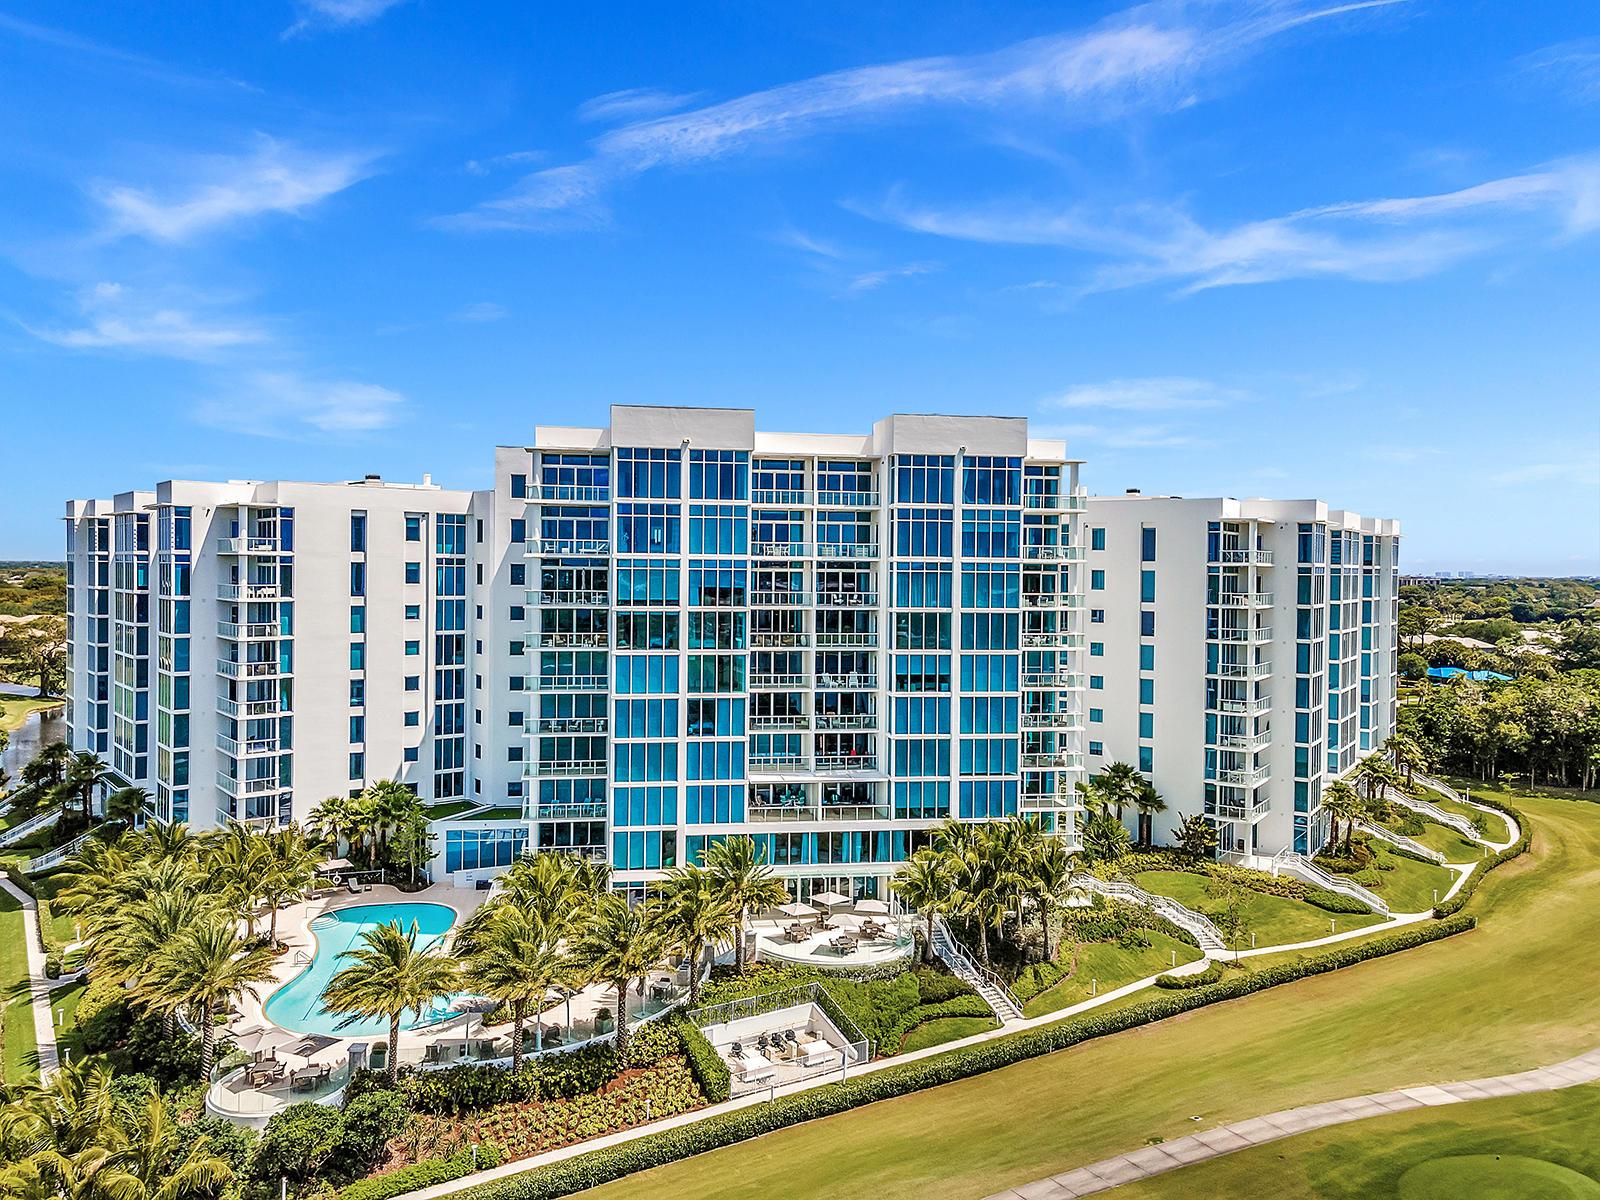 20155  Boca West Drive  C-405 For Sale 10711122, FL